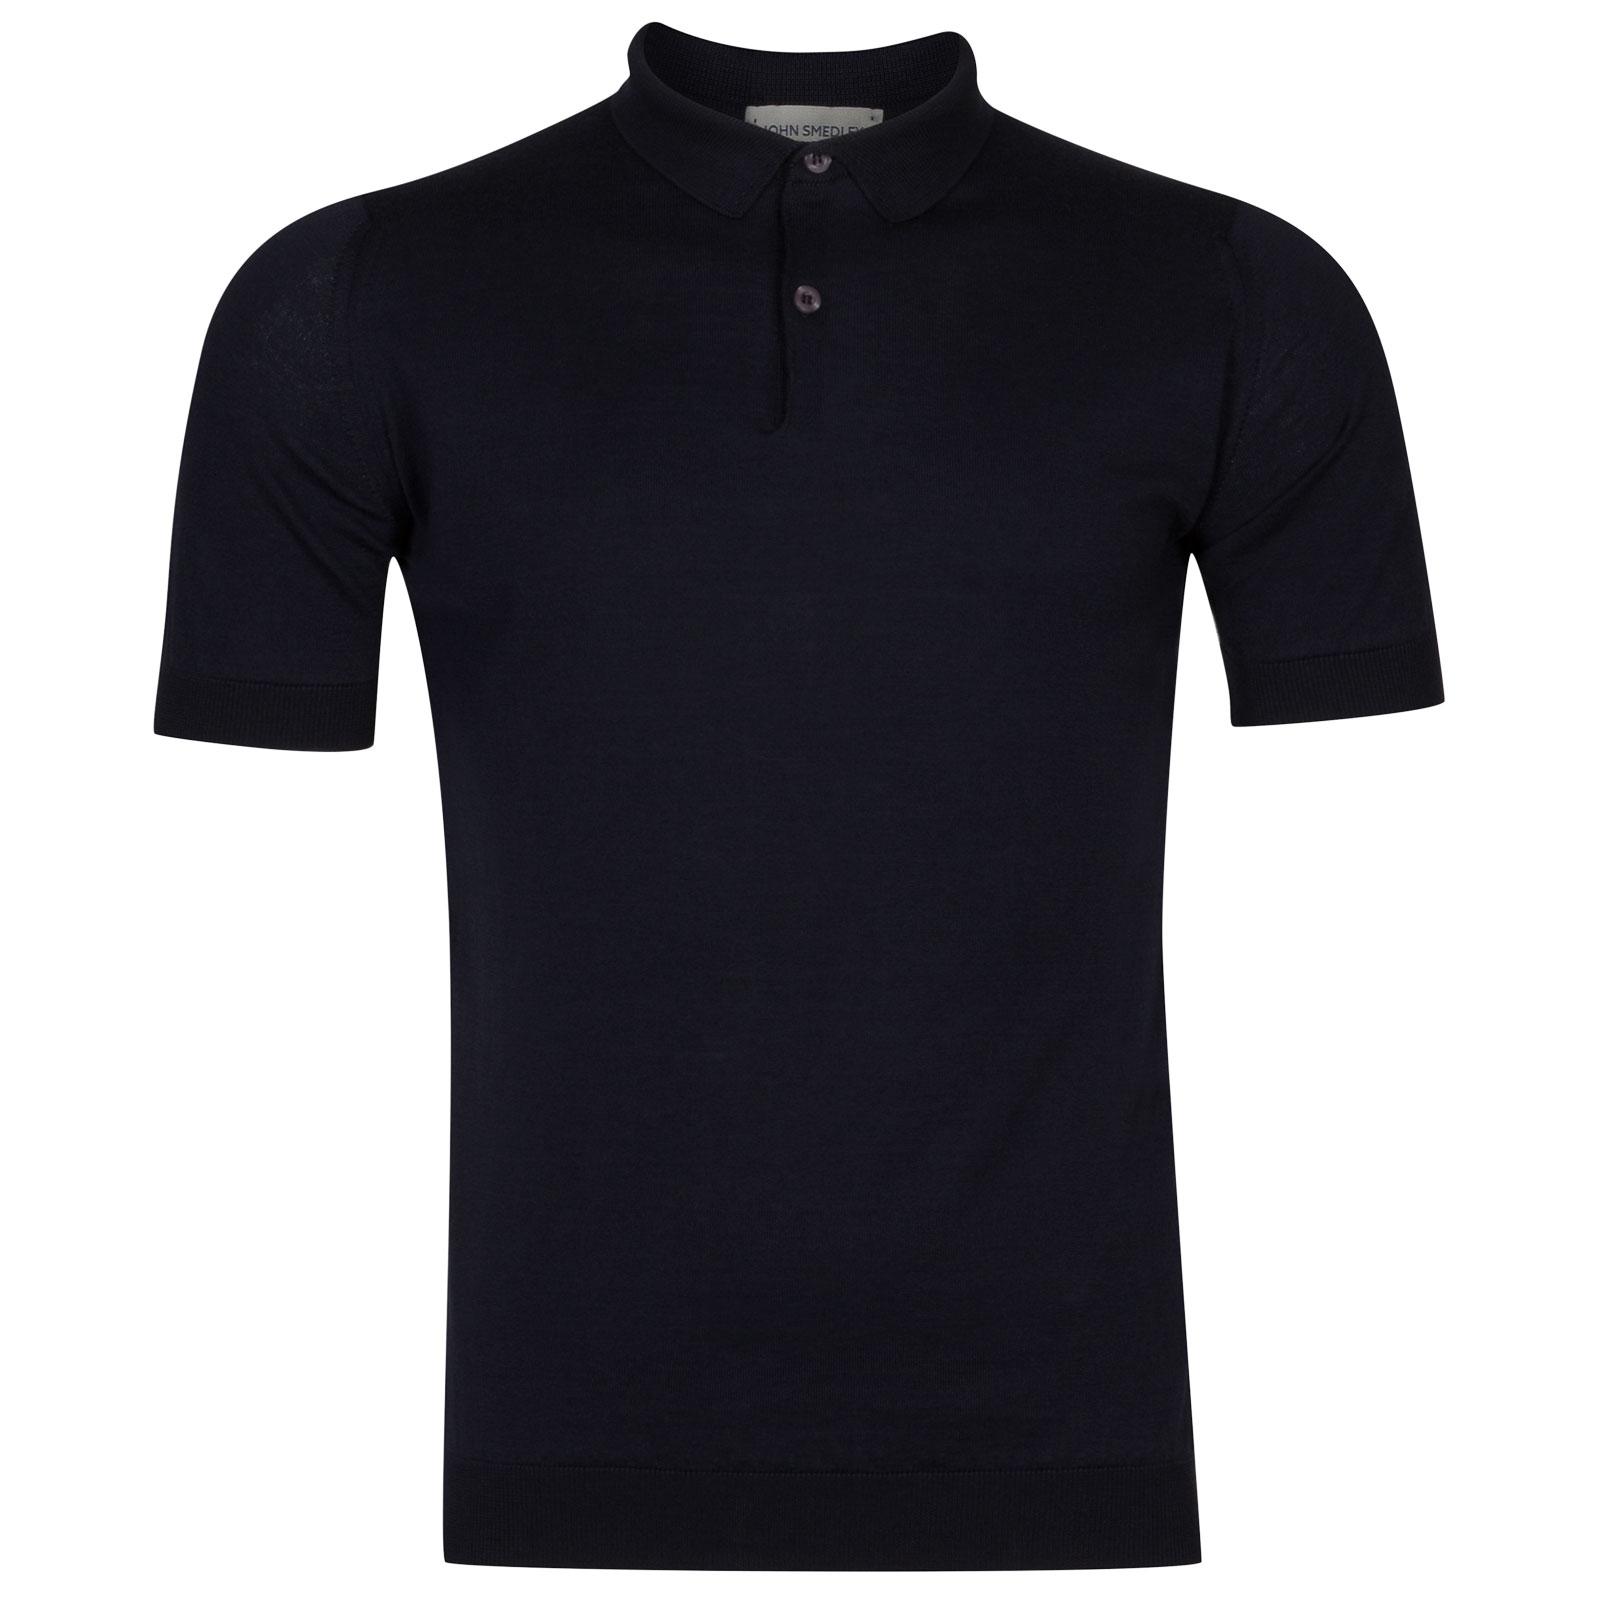 John Smedley rhodes Sea Island Cotton Shirt in Navy-XL